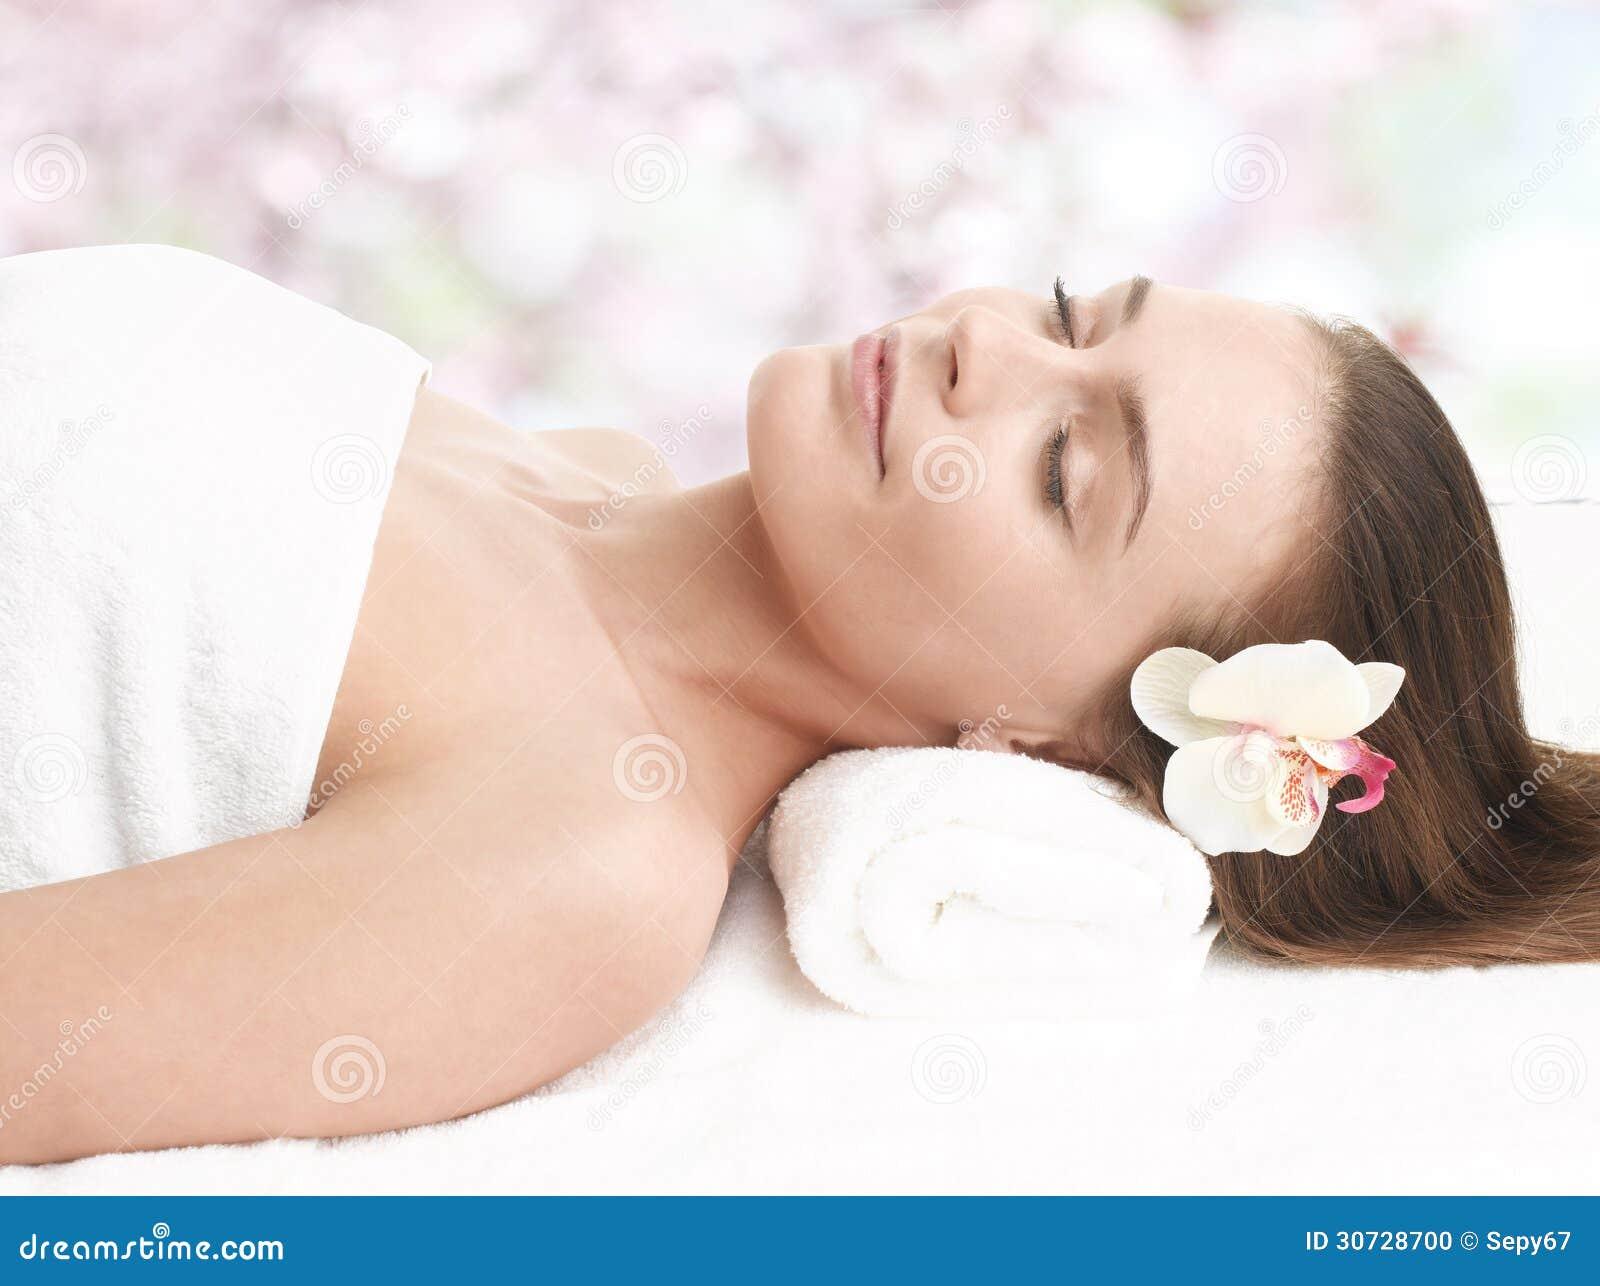 happy massage at michelles massage